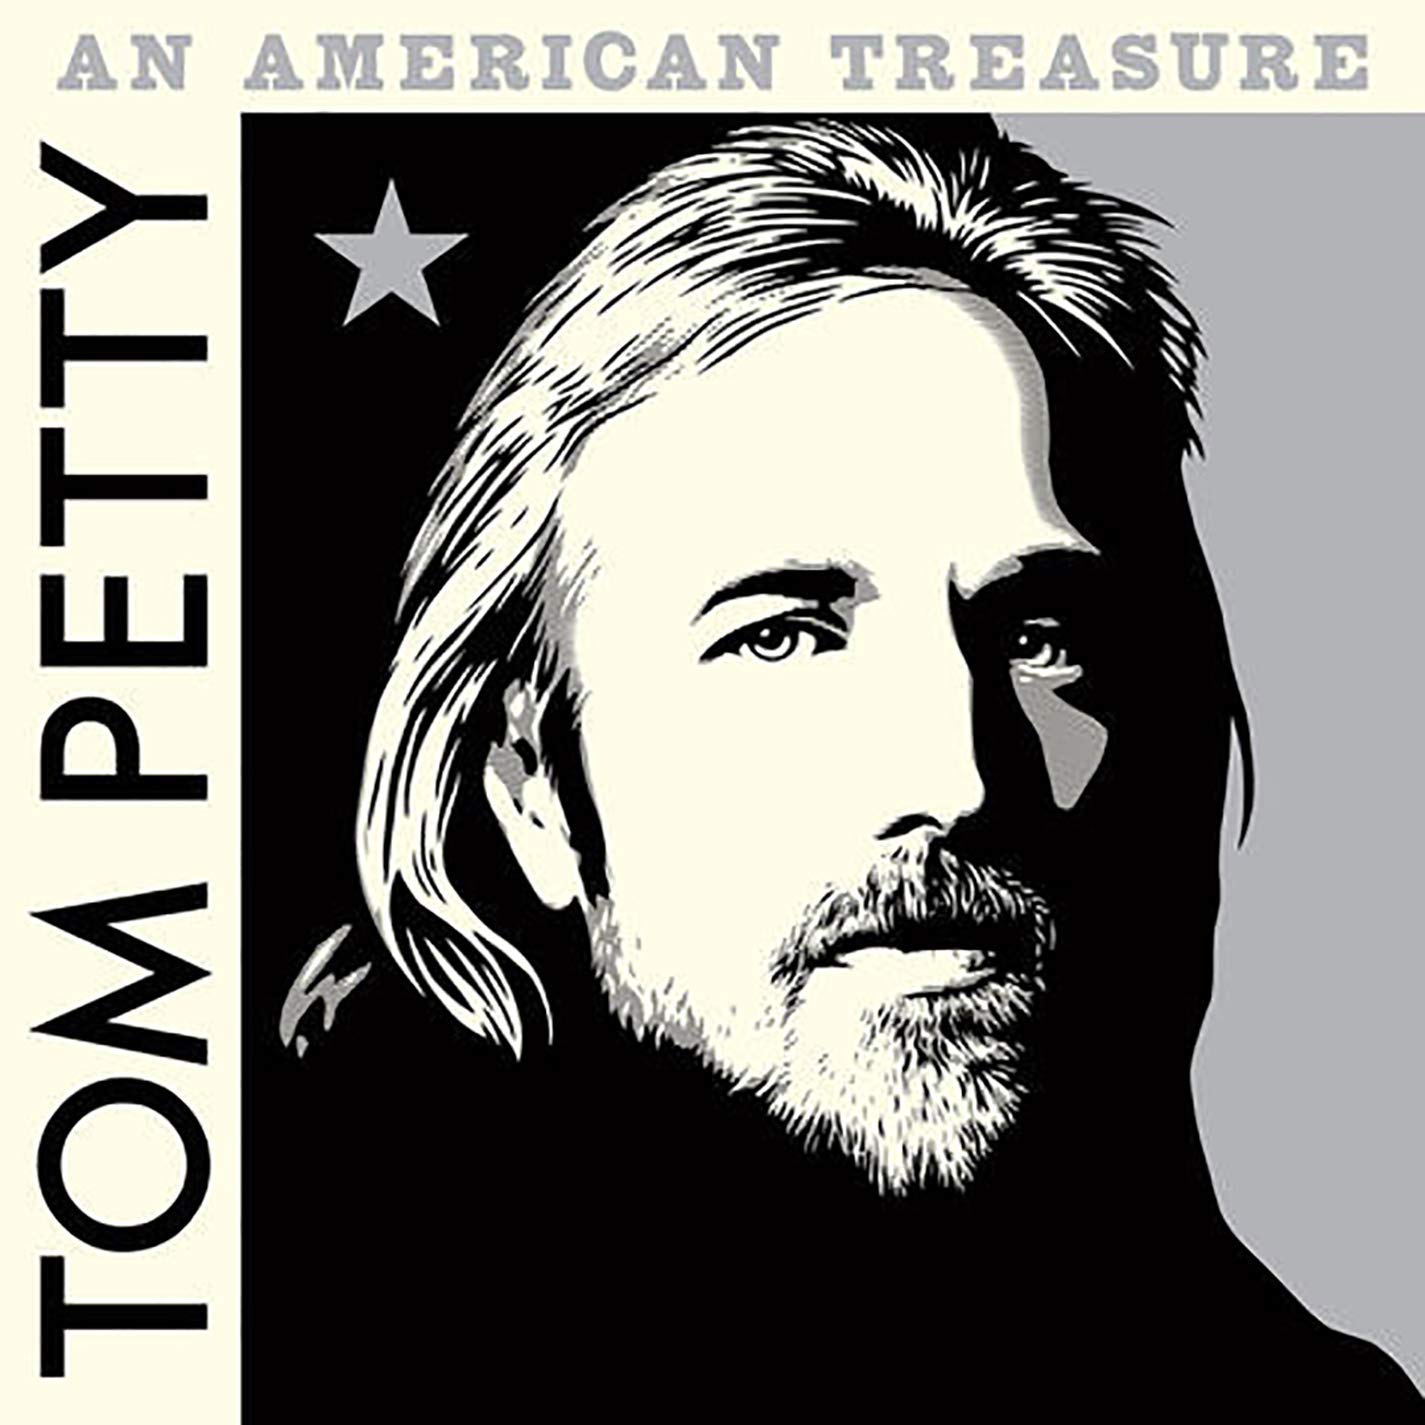 Caption: Tom Petty An American Treasure